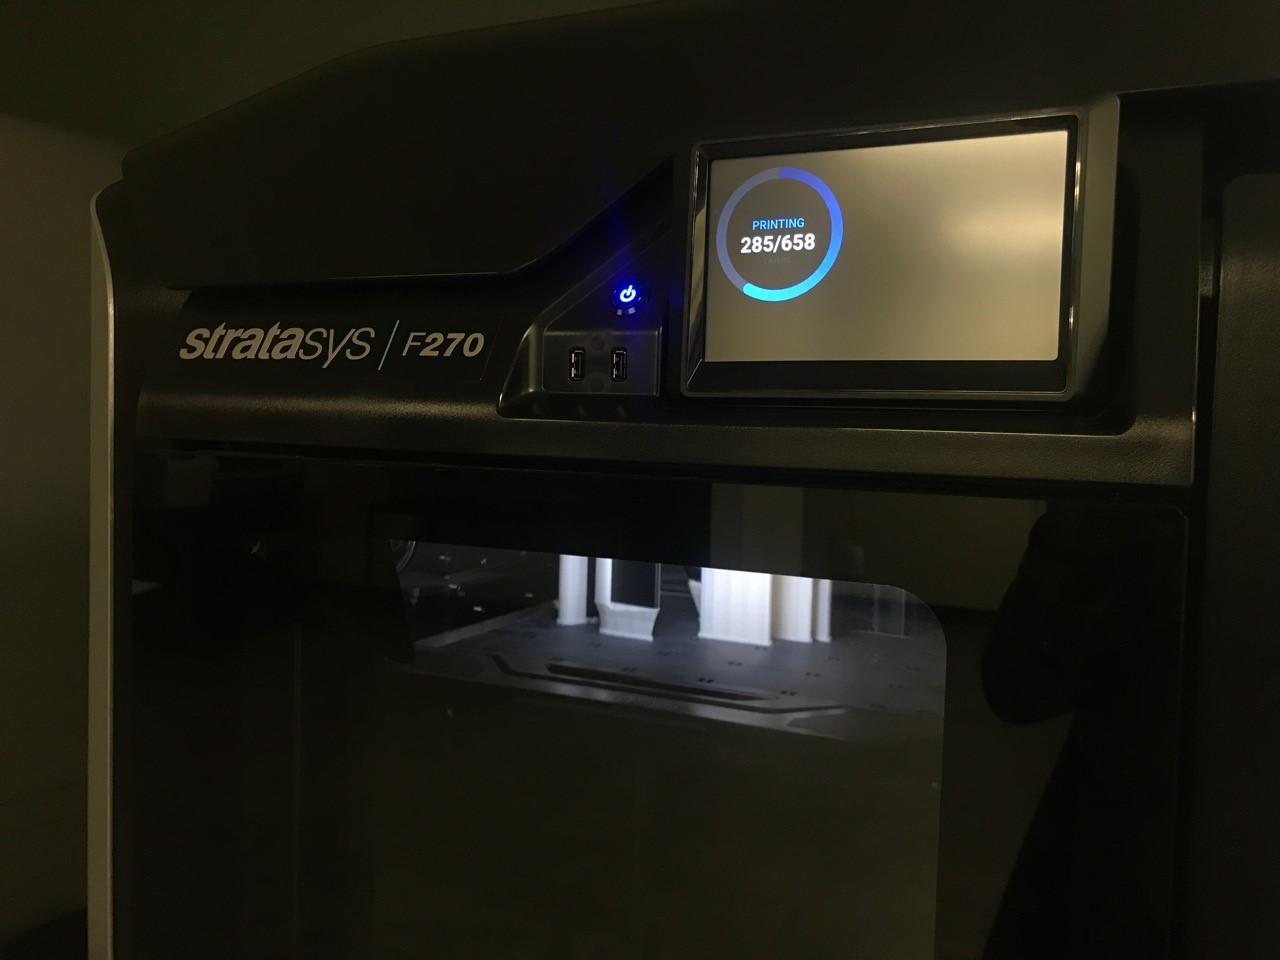 stratasys-f270-printing